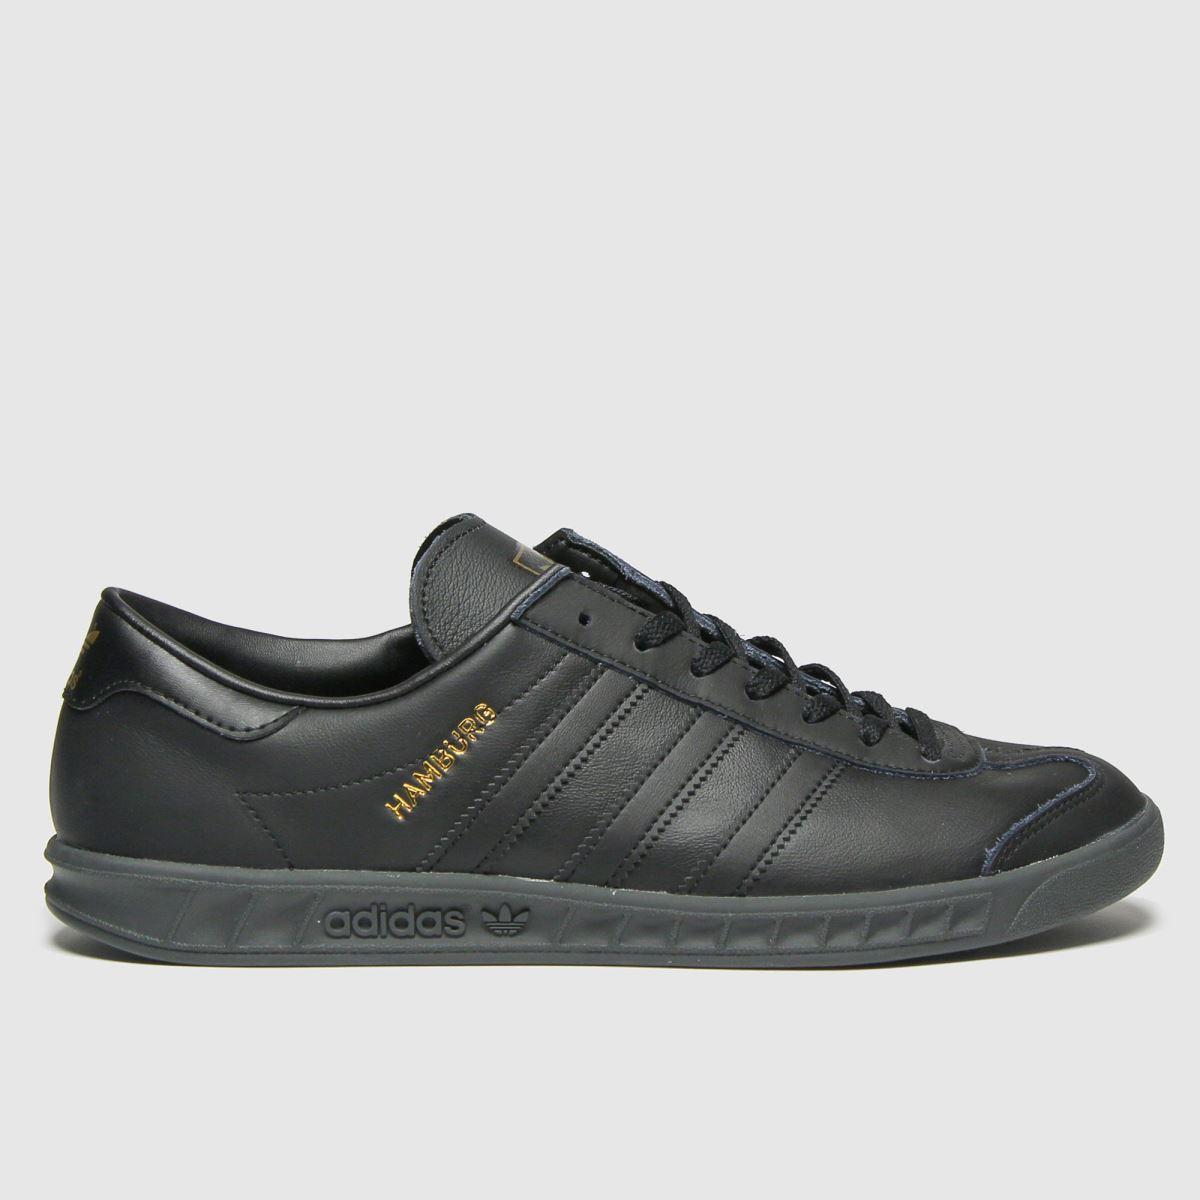 Adidas Black Hamburg Trainers